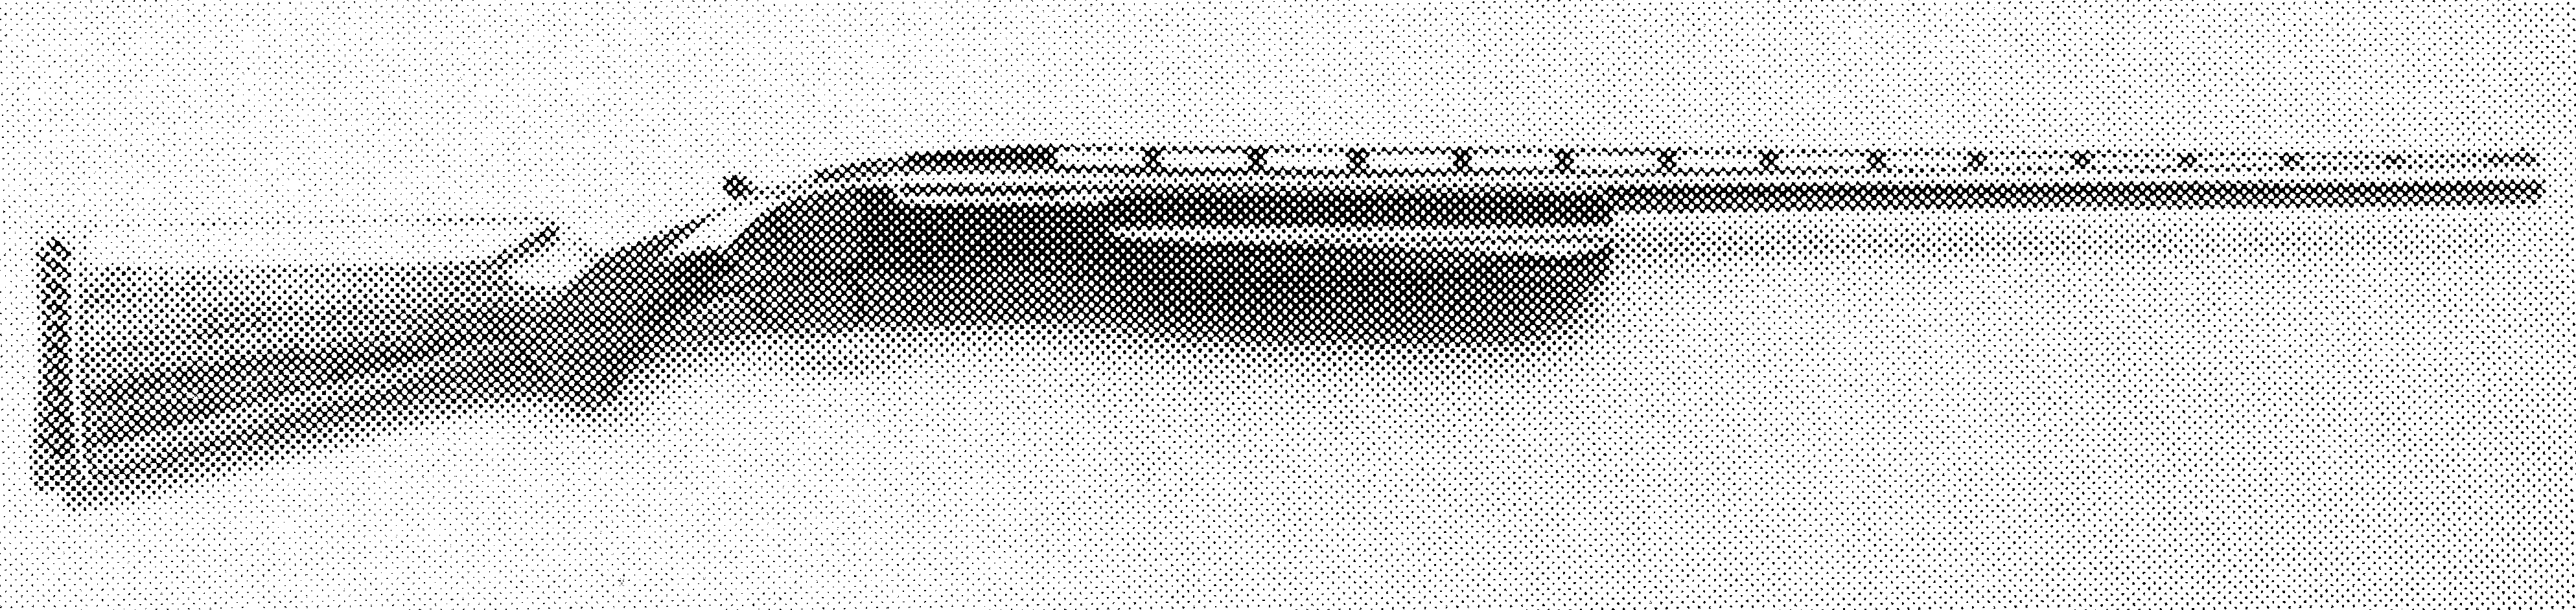 BT-99